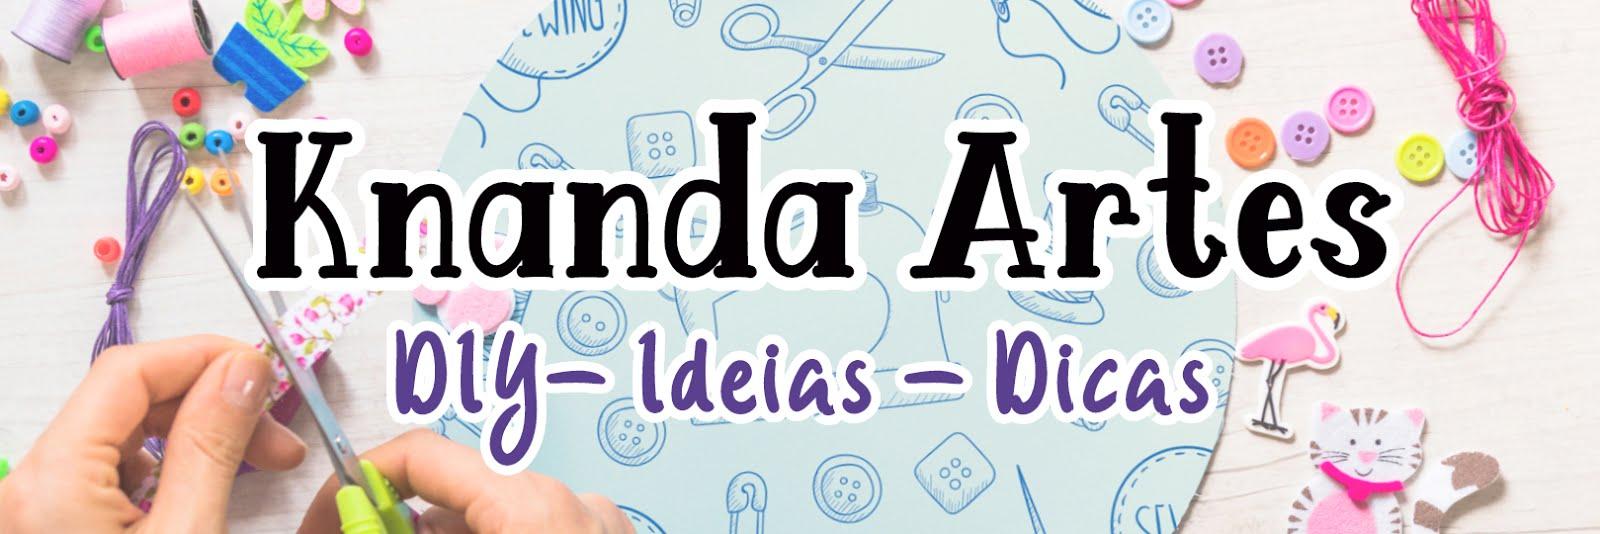 Knanda Artes - DIY